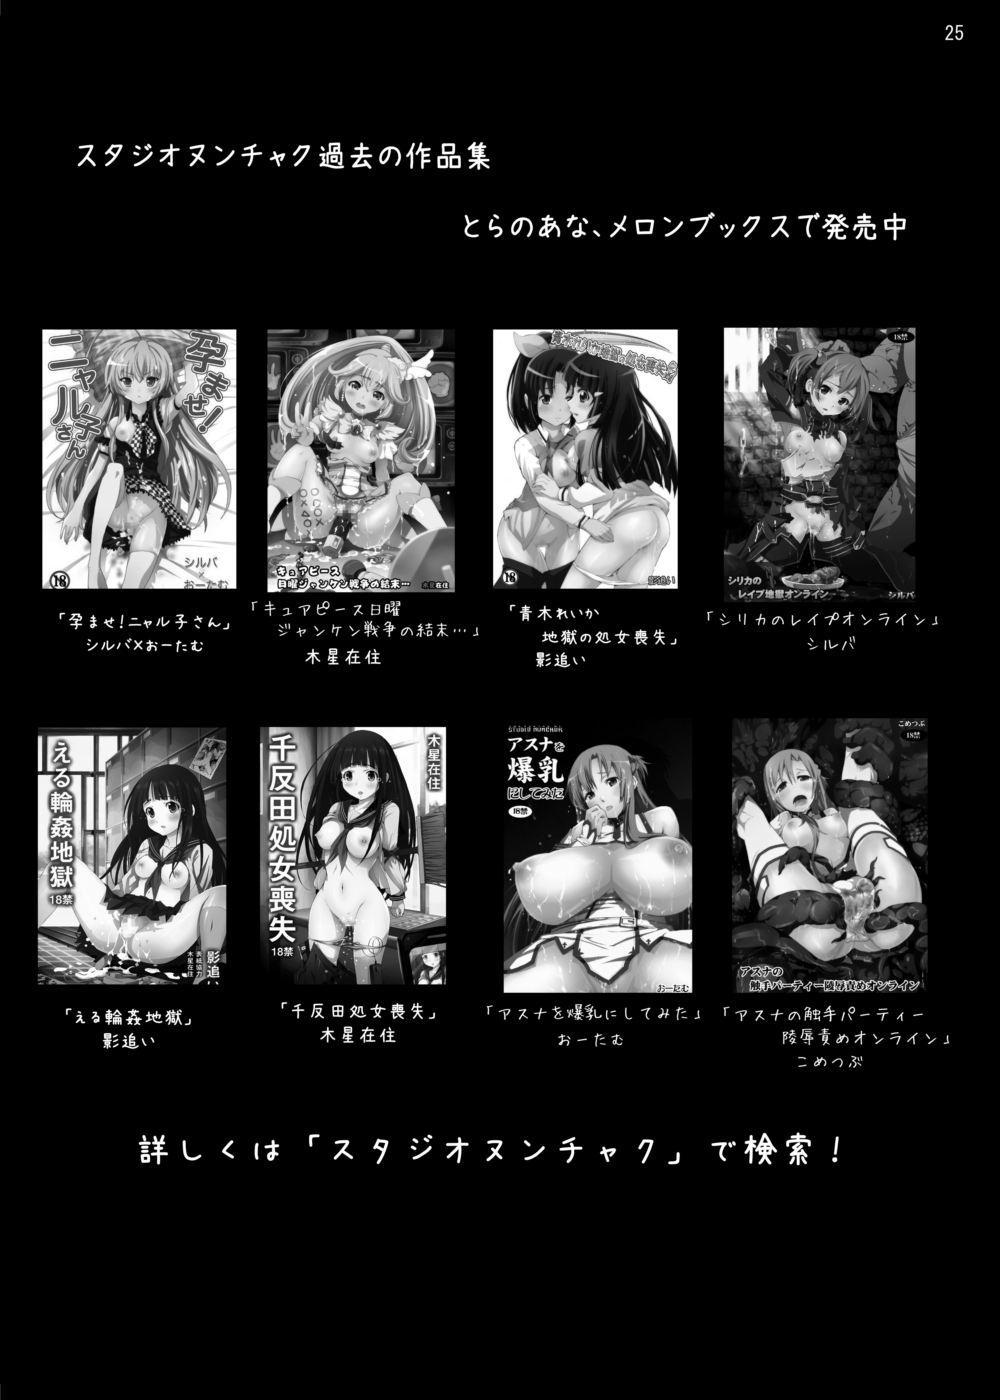 Asuna in Tentacle Party Rape Online 23